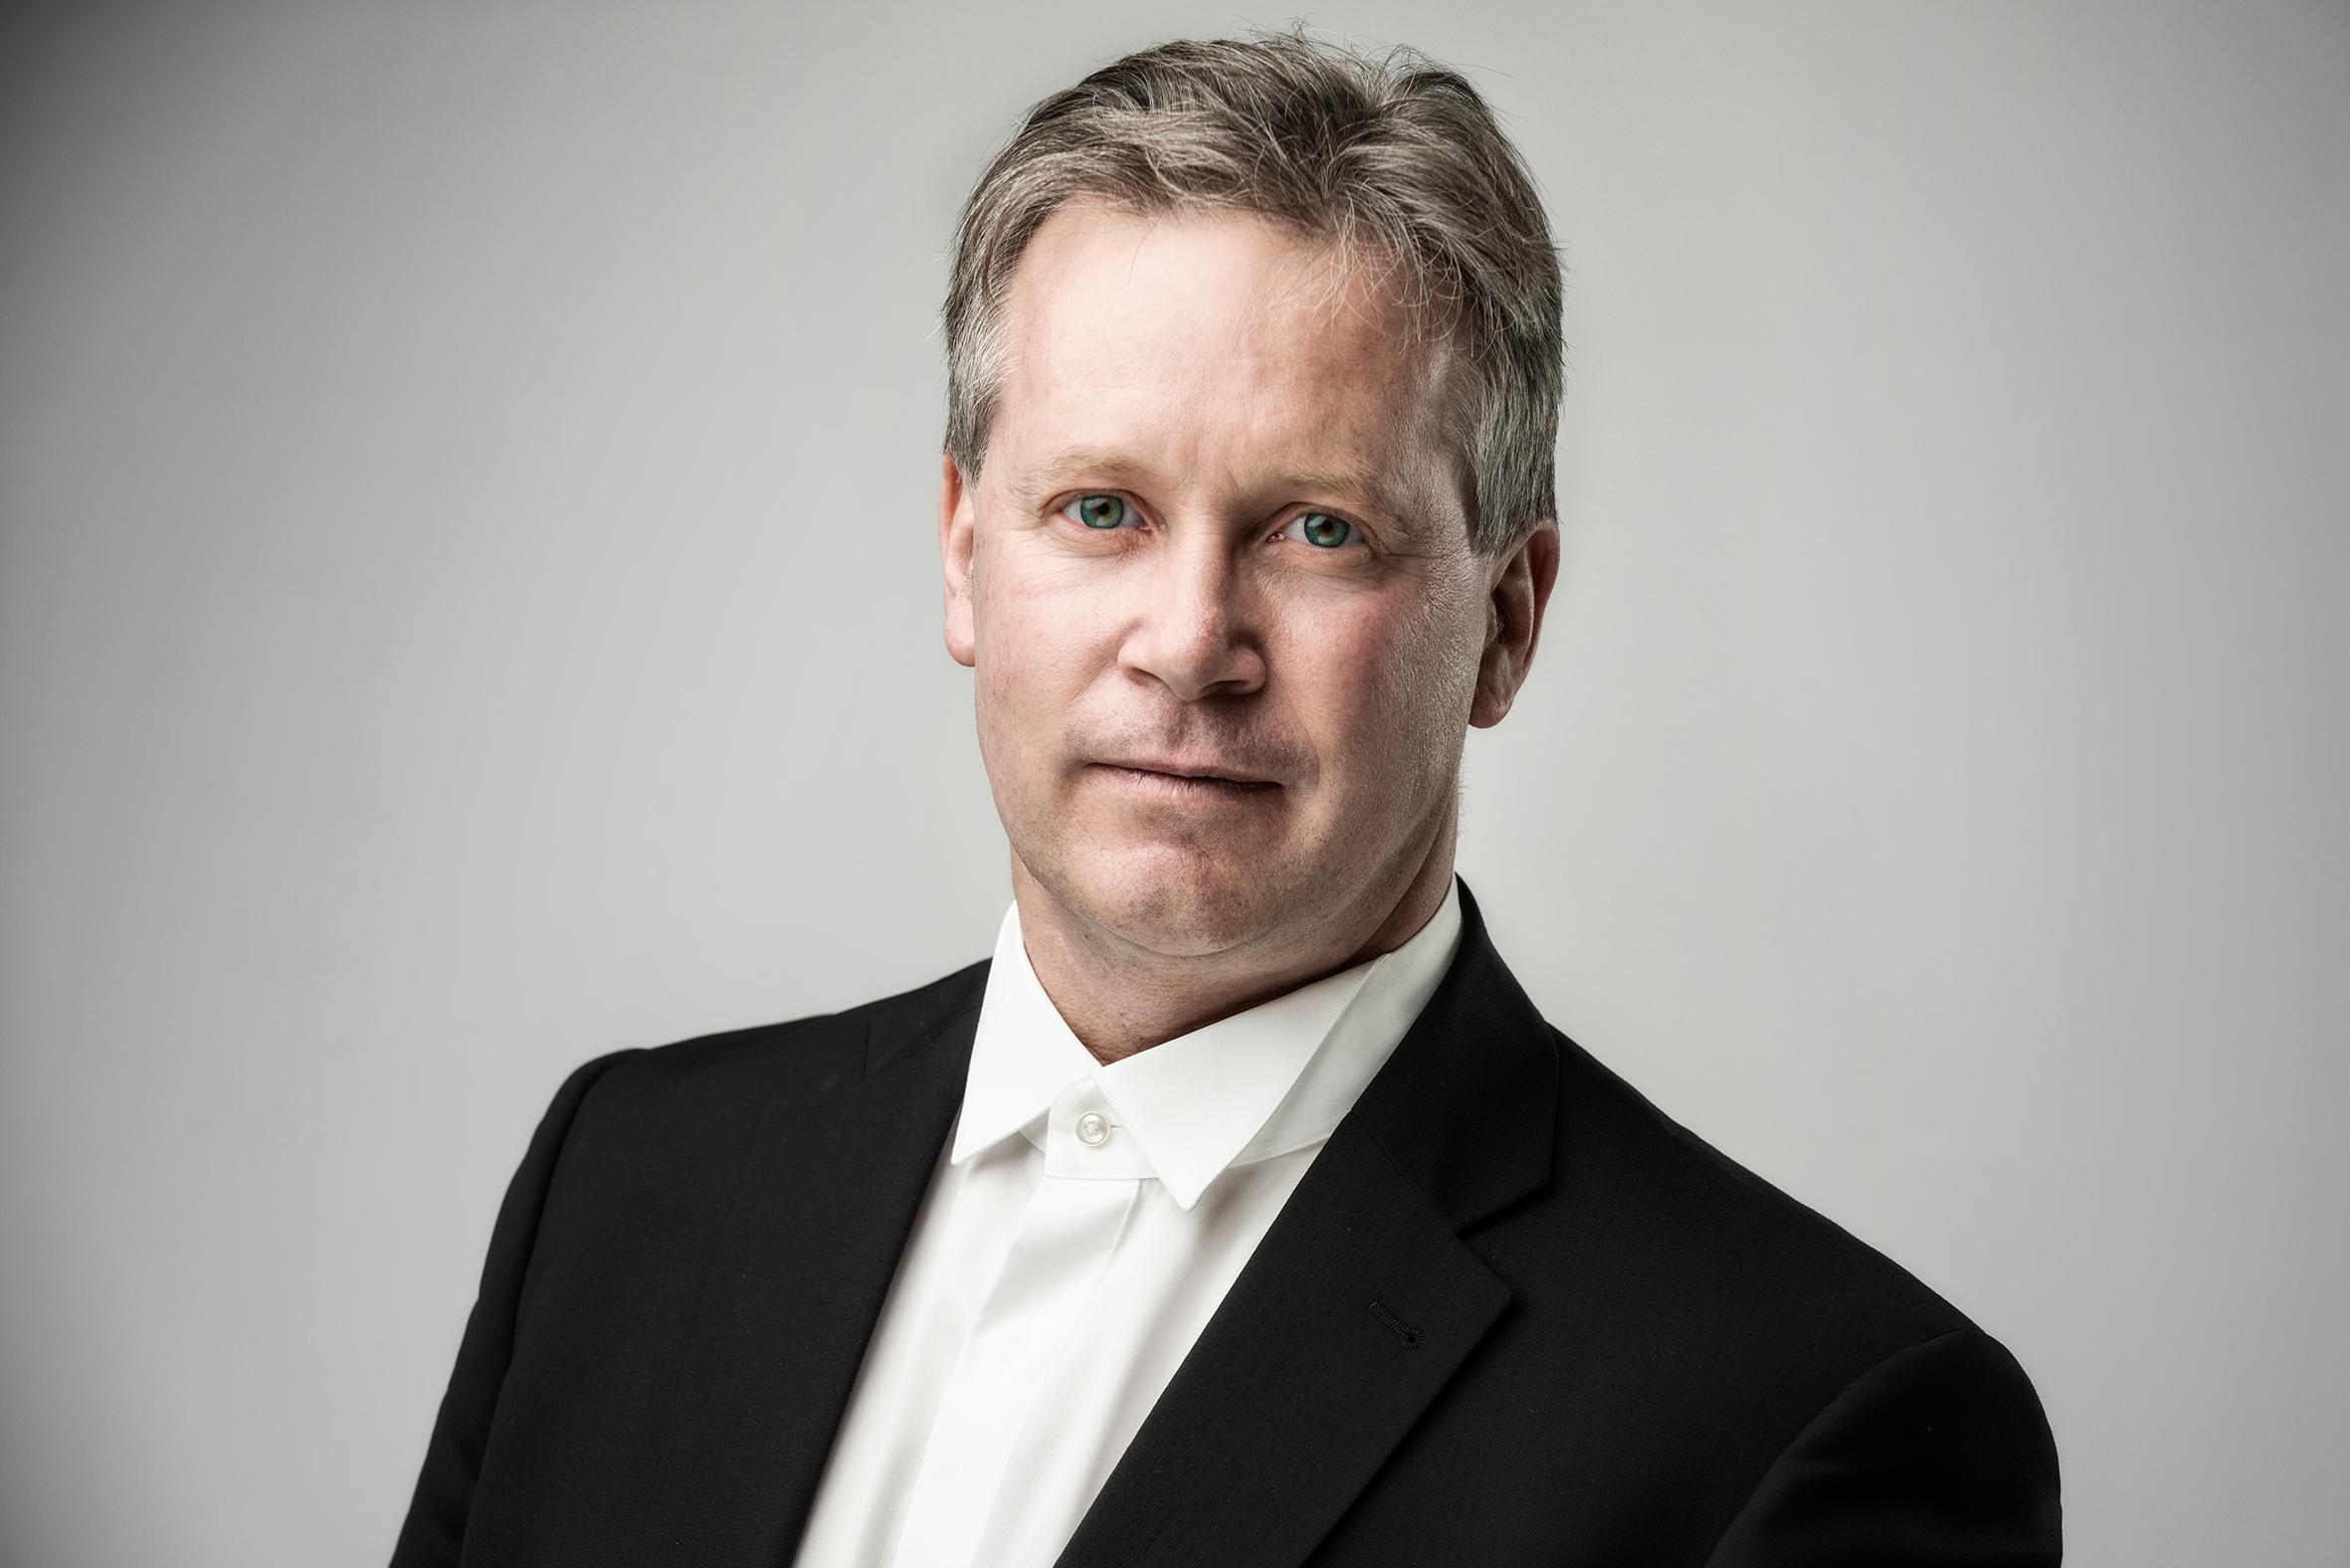 Uwe Diegel, Creator of Lifeina